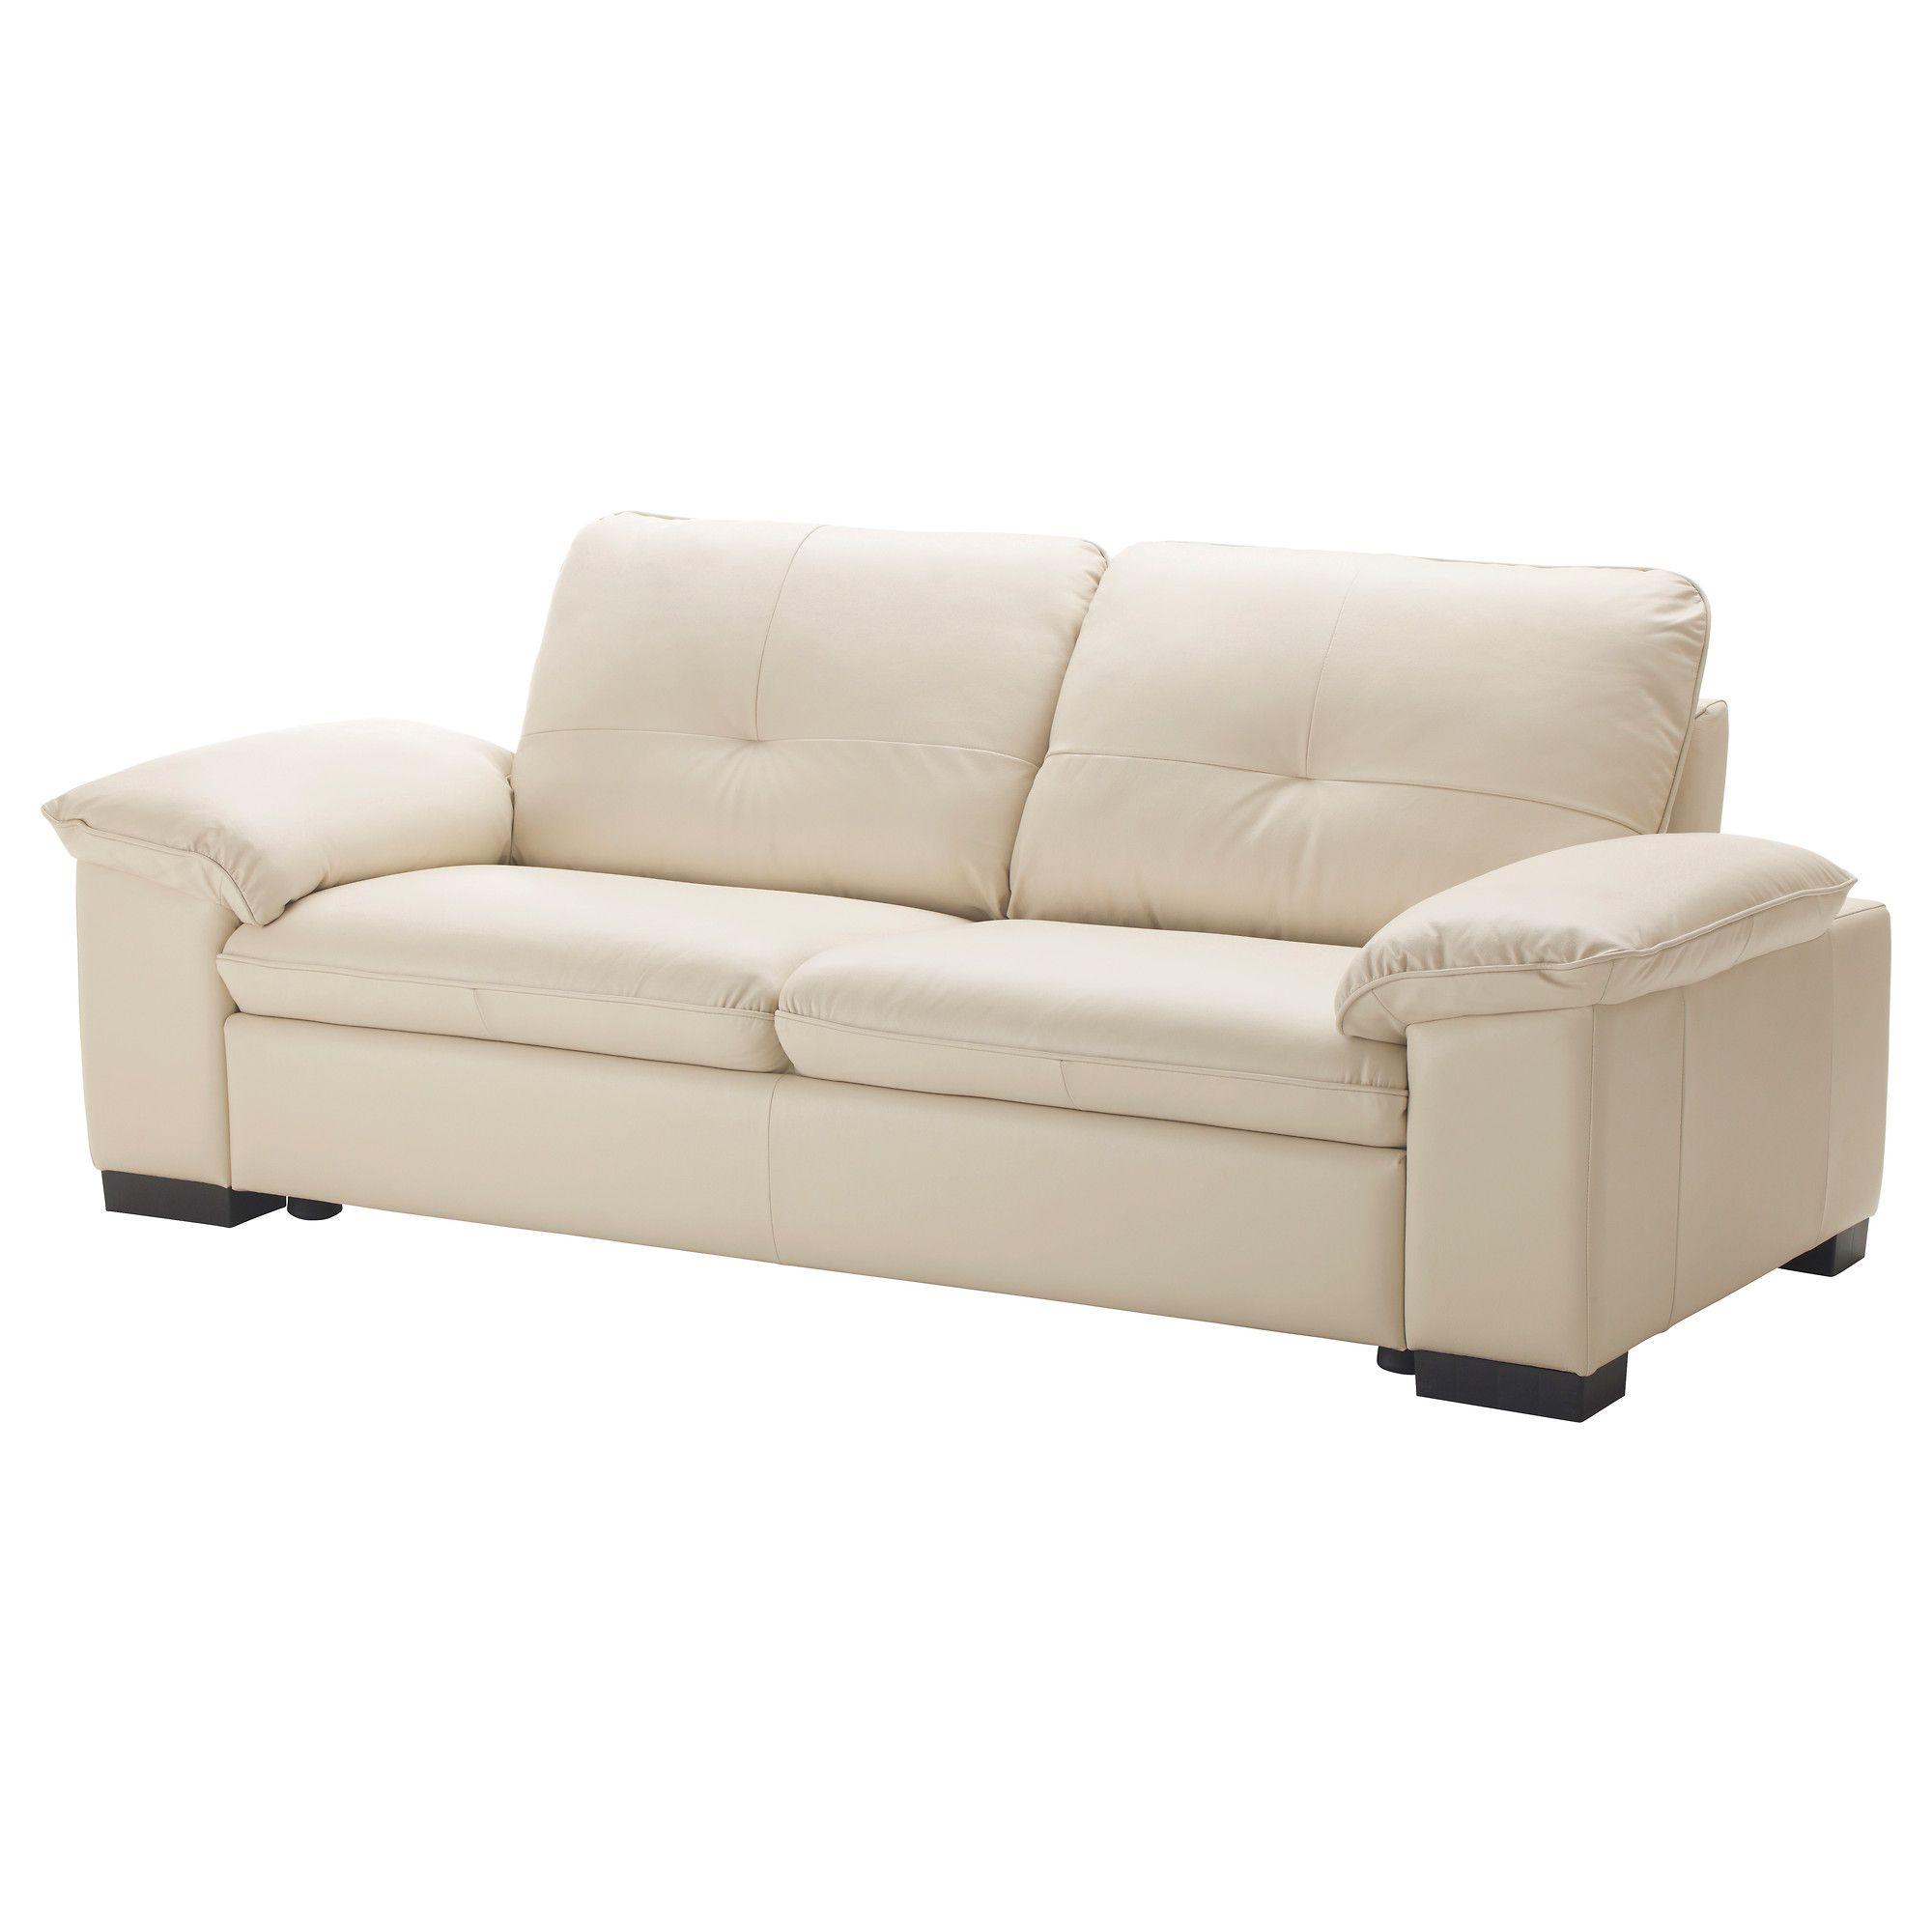 sofasandmore kramfors leather corner sofa i love the quotdagstorp quot at ikea am worried